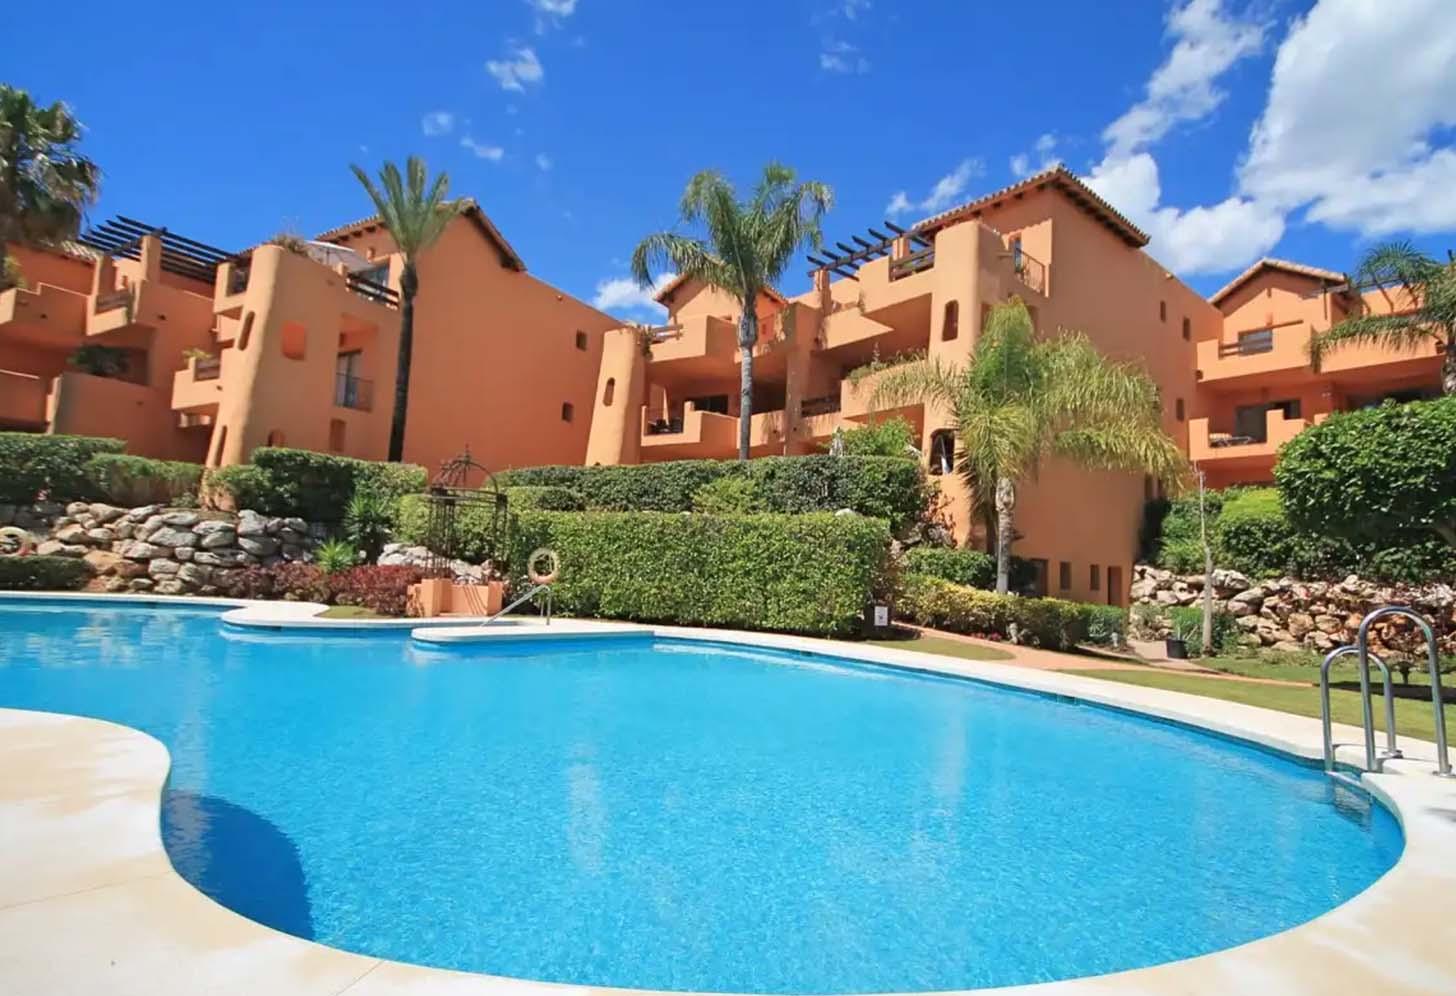 acheter un appartement avec piscine bel air andalousie 001